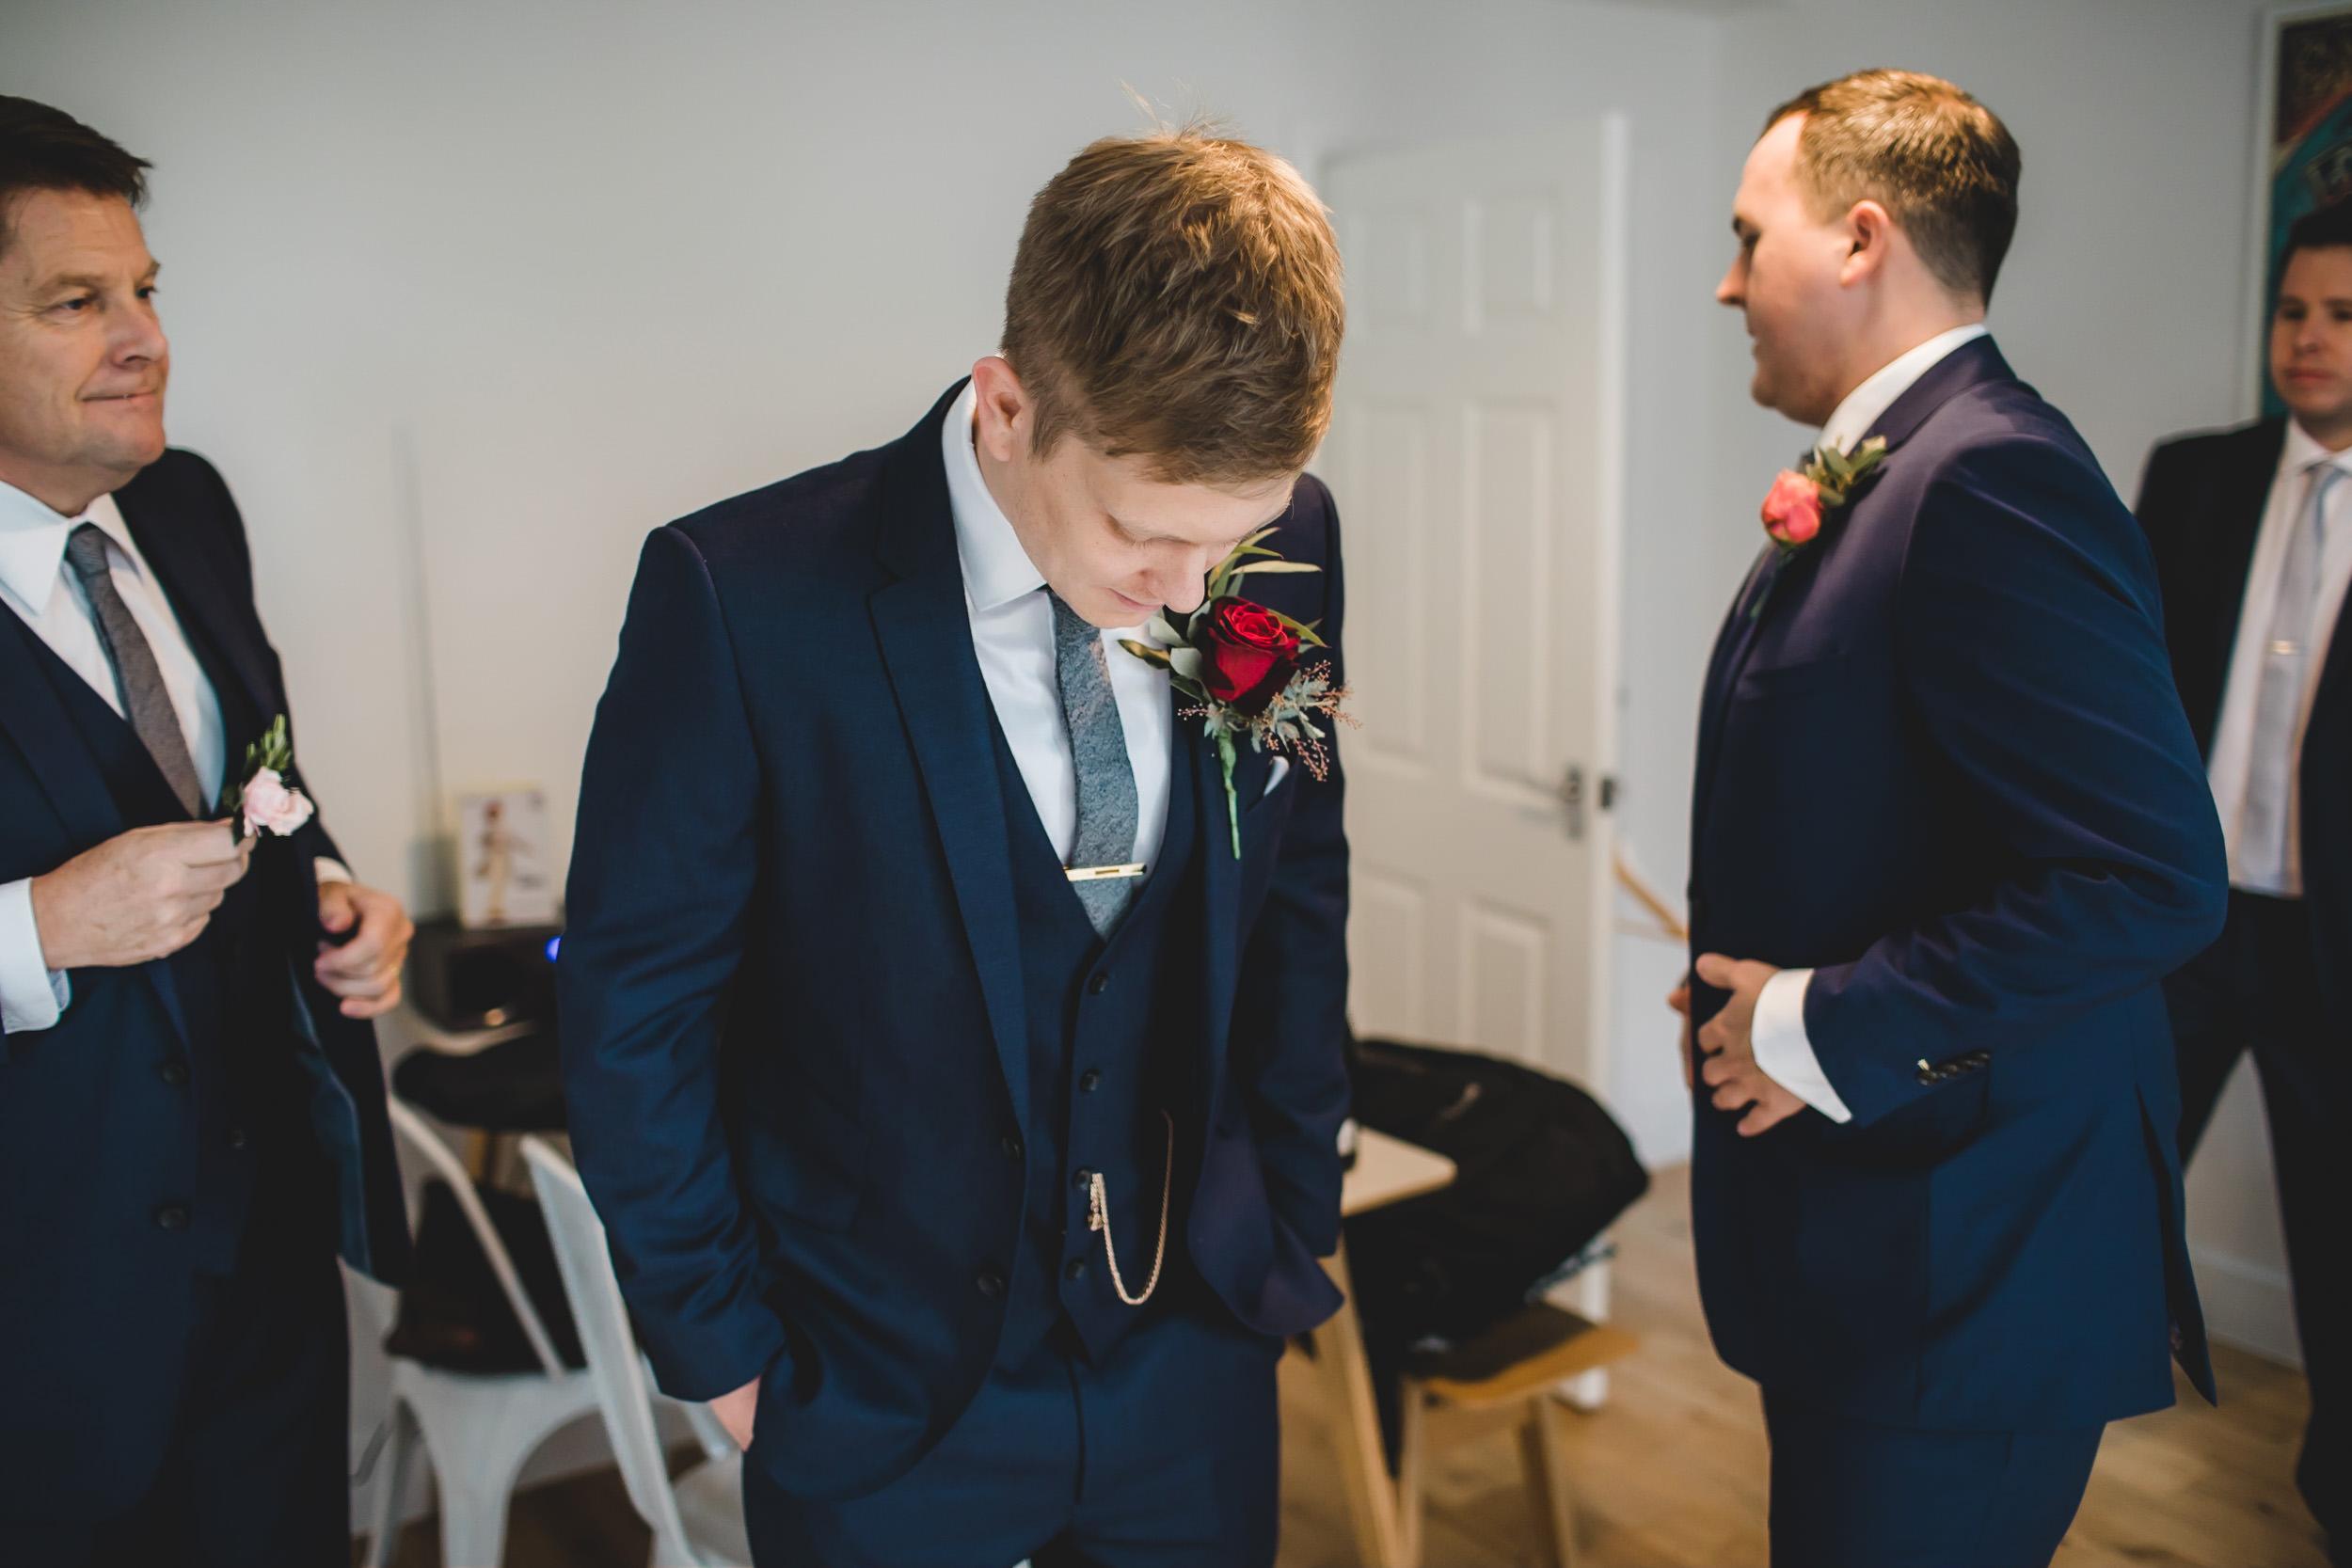 groom waits nervously for wedding